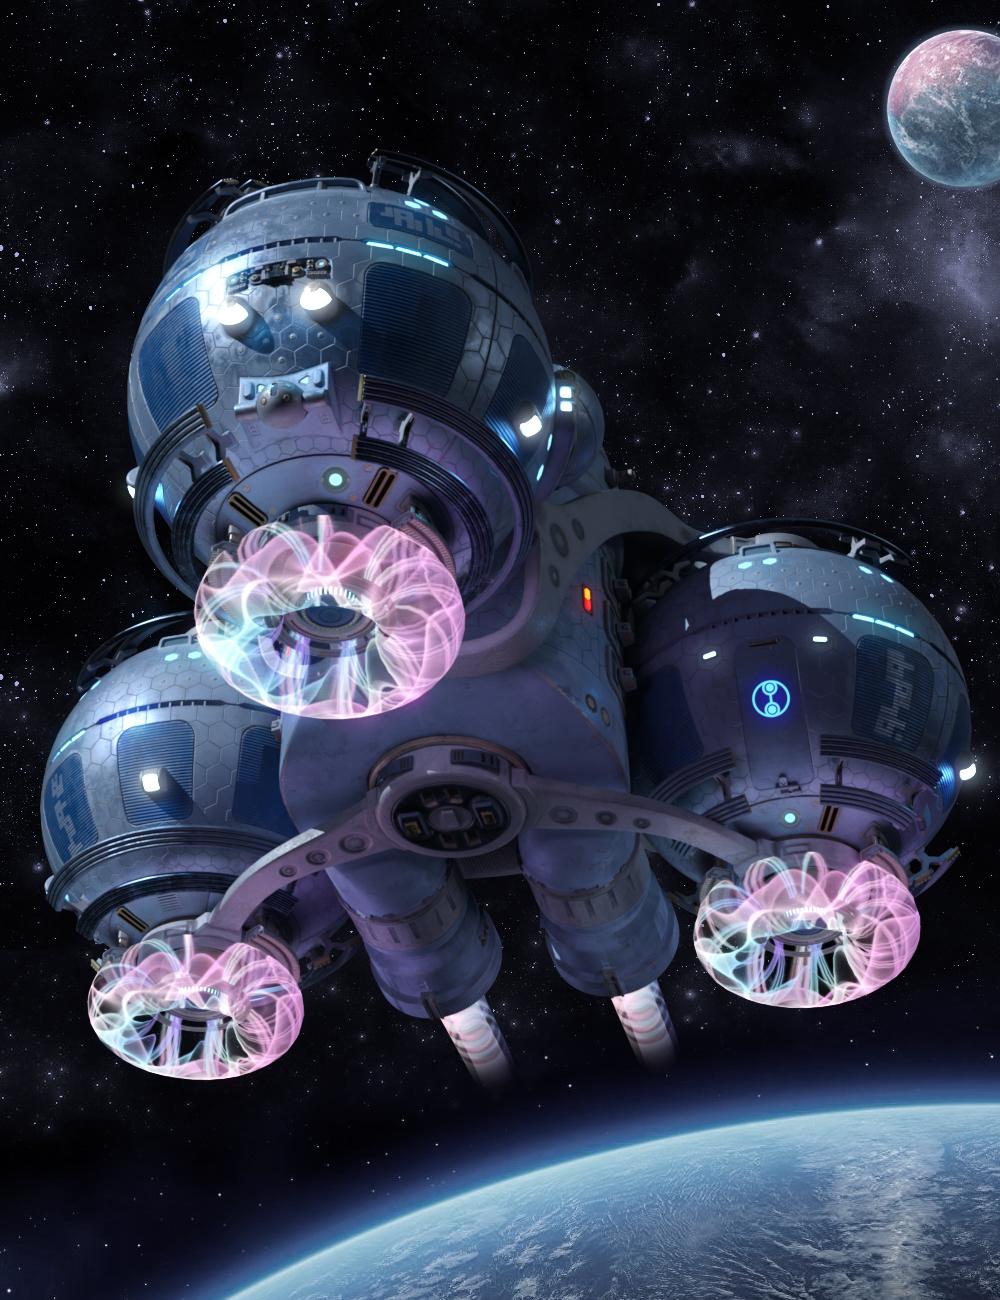 Starship Gaya by: petipet, 3D Models by Daz 3D